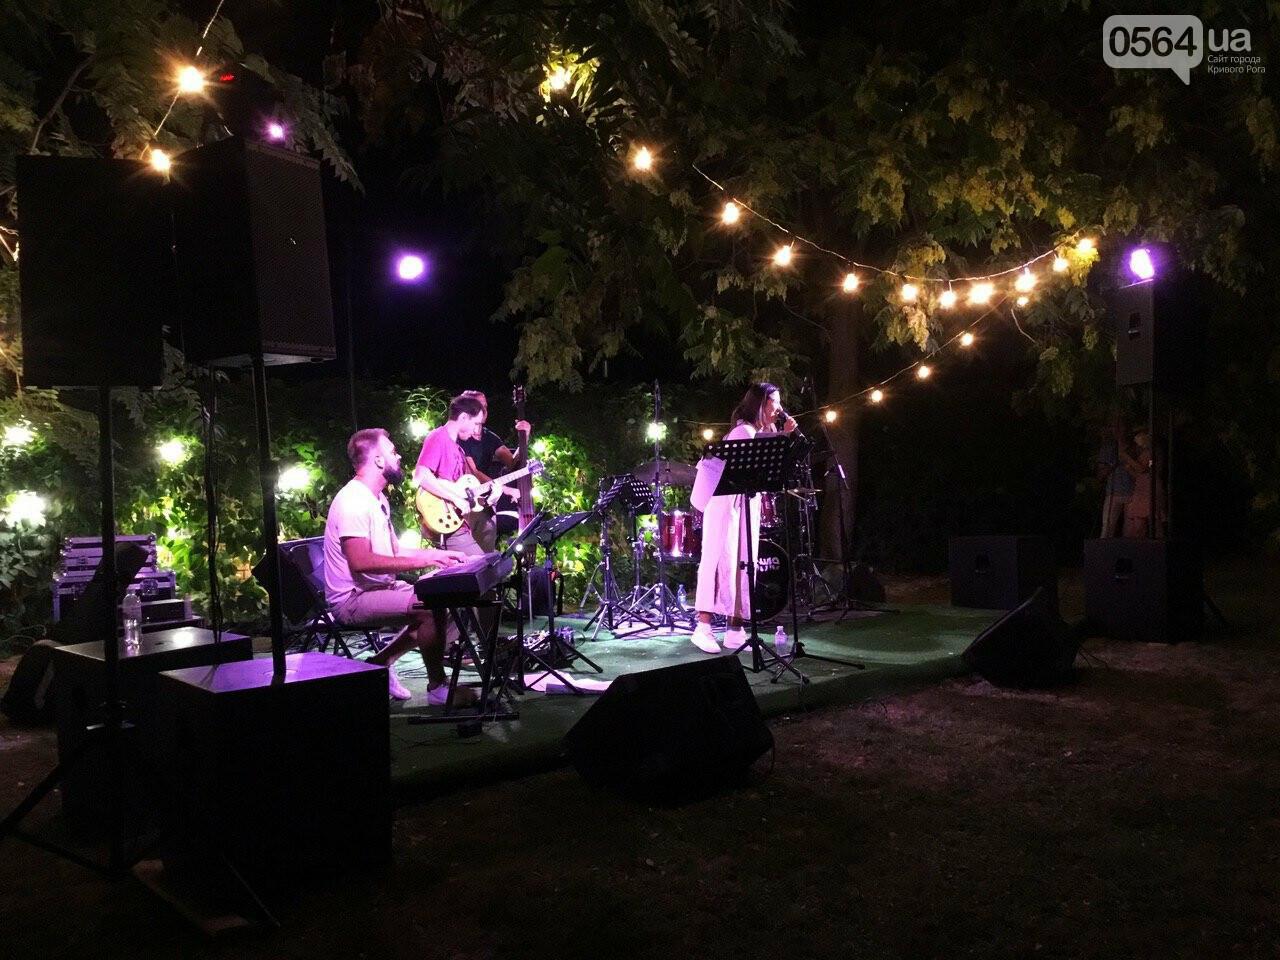 Под звездным небом криворожане наслаждались летним джазом от  Advantage Project, - ФОТО, ВИДЕО , фото-7